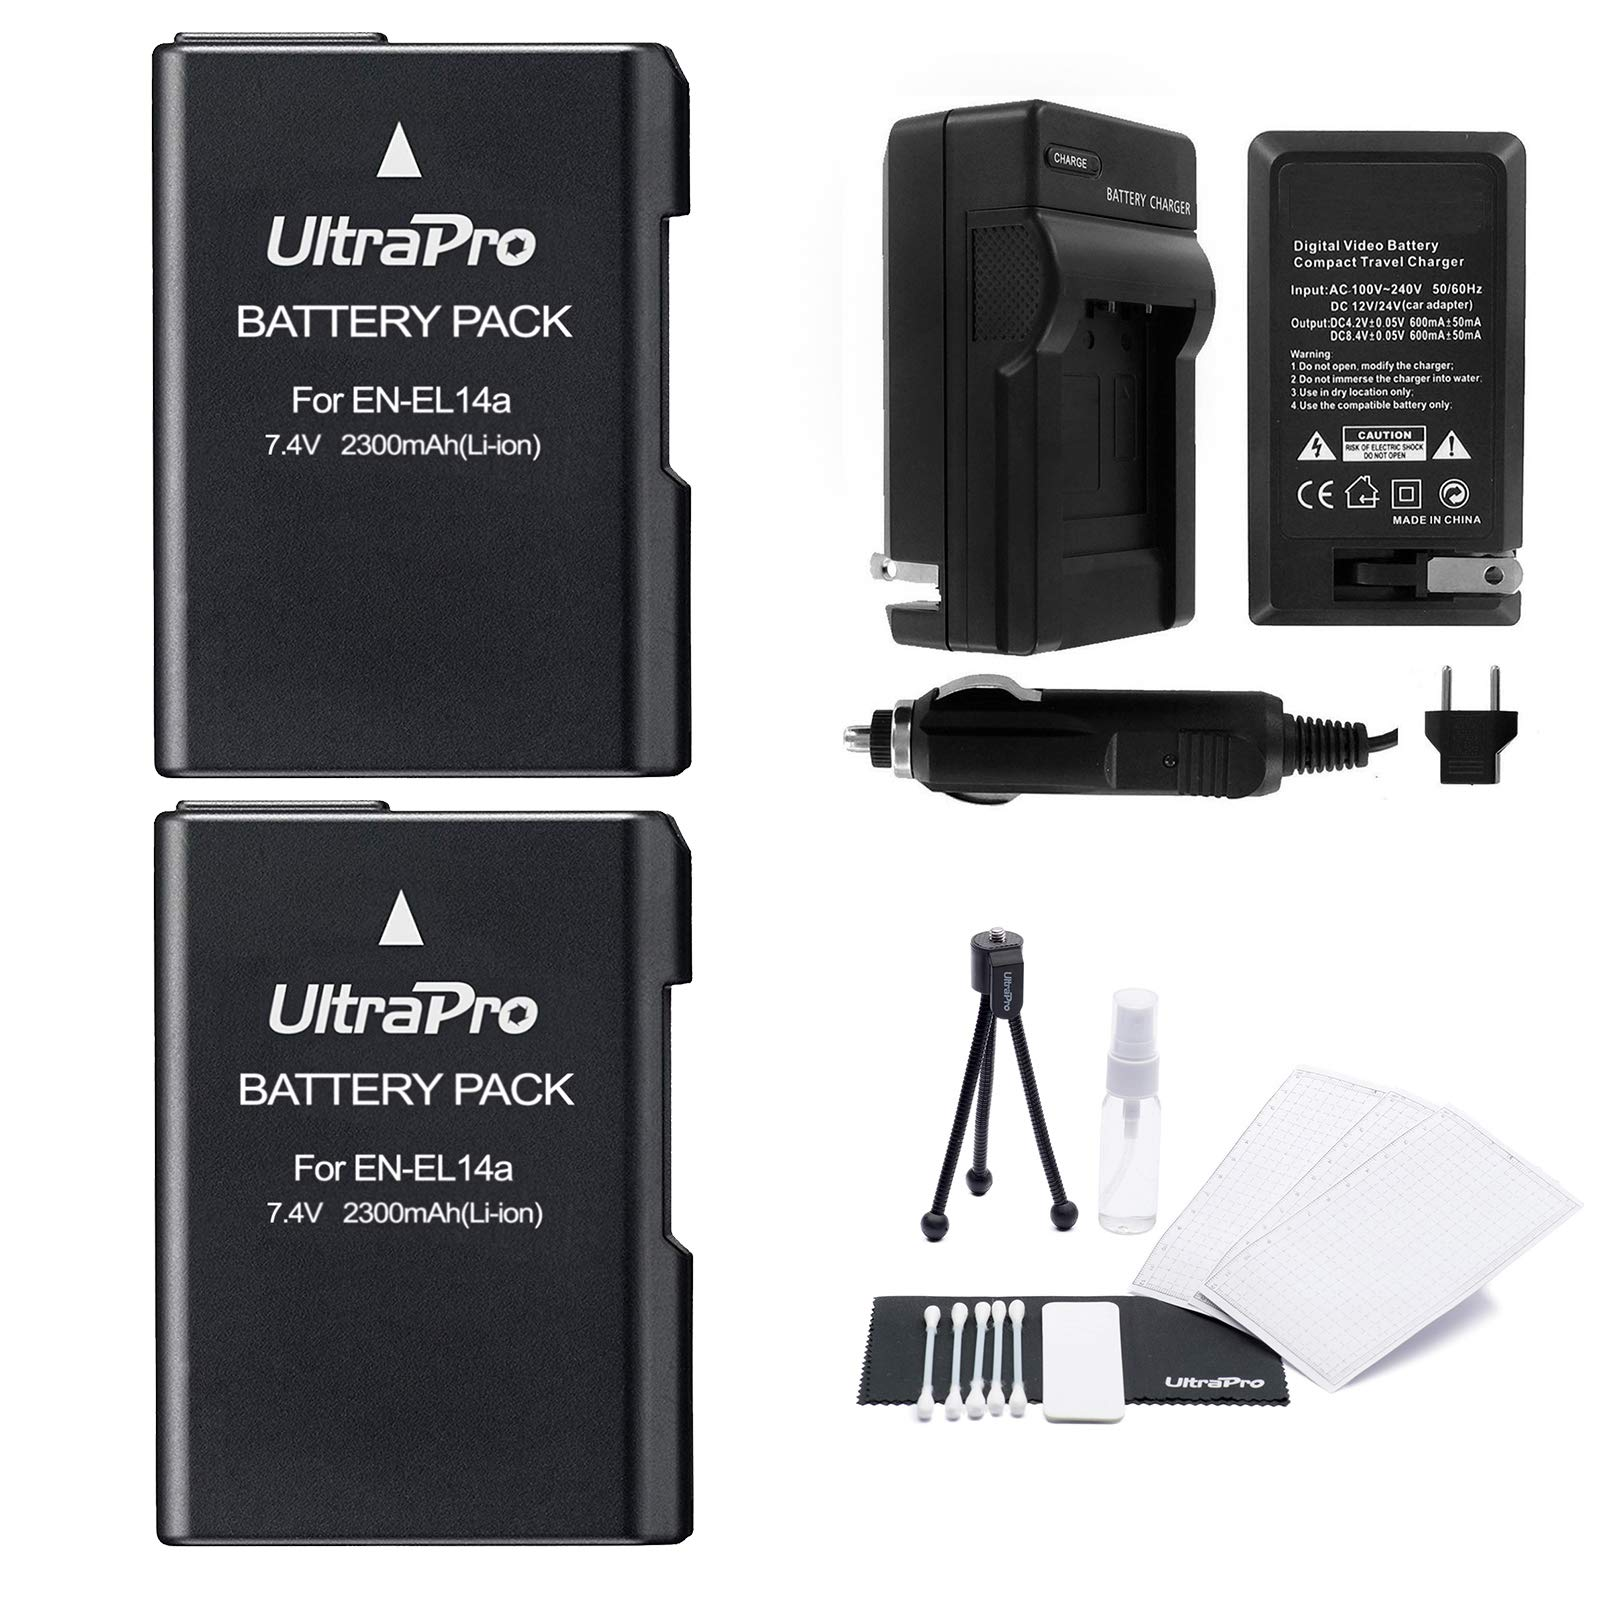 EN-EL14 / EN-EL14a Battery 2-Pack Bundle with Rapid Travel Charger and UltraPro Accessory Kit for Select Nikon Cameras Including D3100, D3200, D3300, D3400, D3500, D5500, D5300, D5200, and D5100